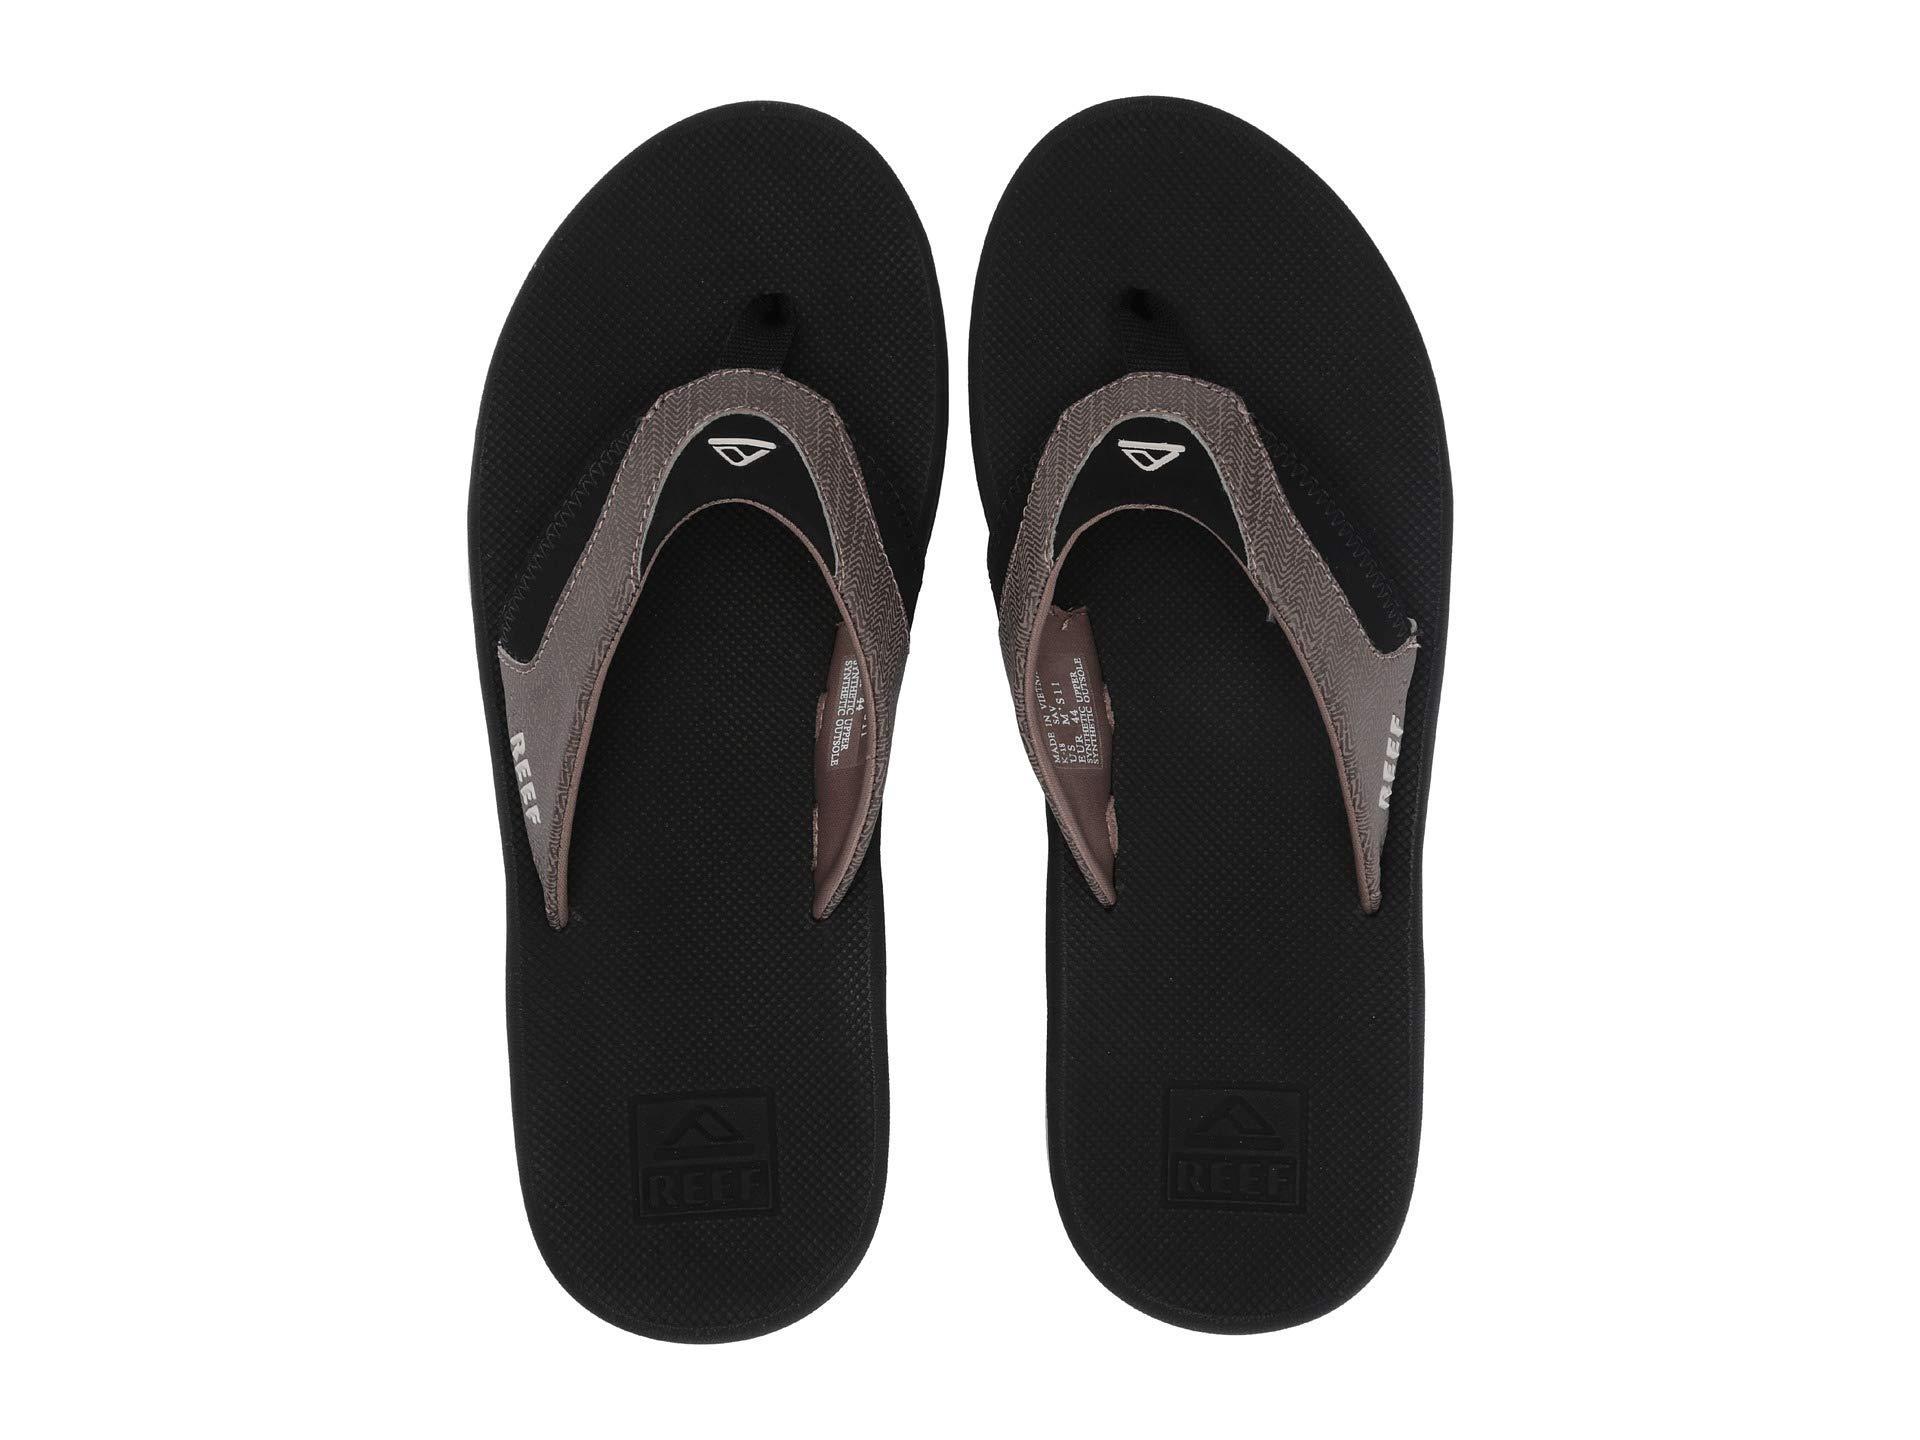 776f26d2cba2 Lyst - Reef Fanning Prints (black Hound) Men s Sandals in Black for Men